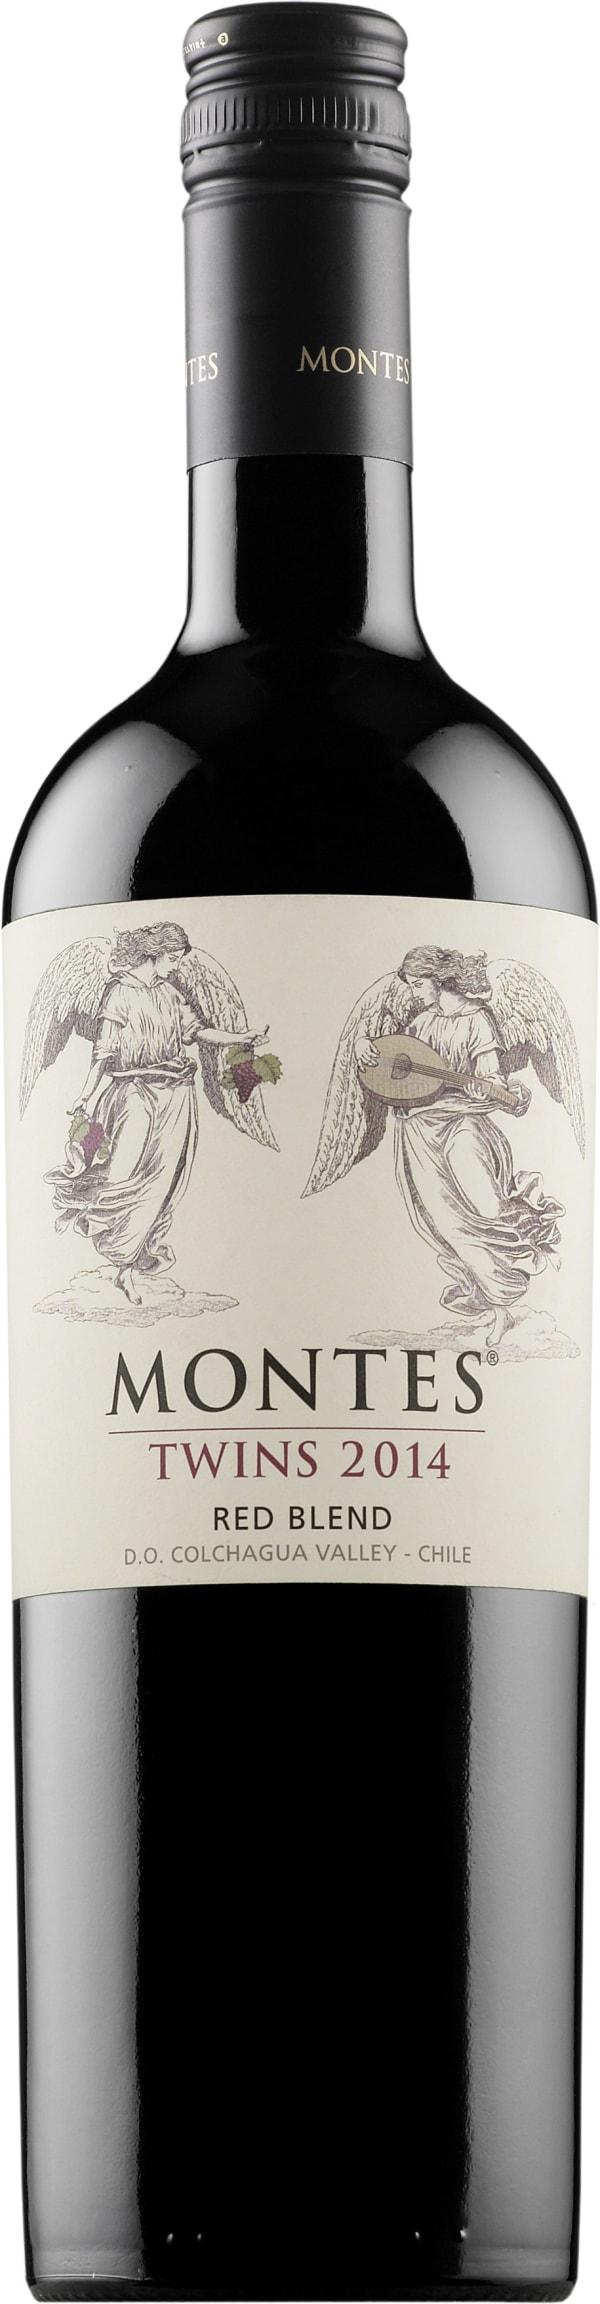 Montes Twins 2014